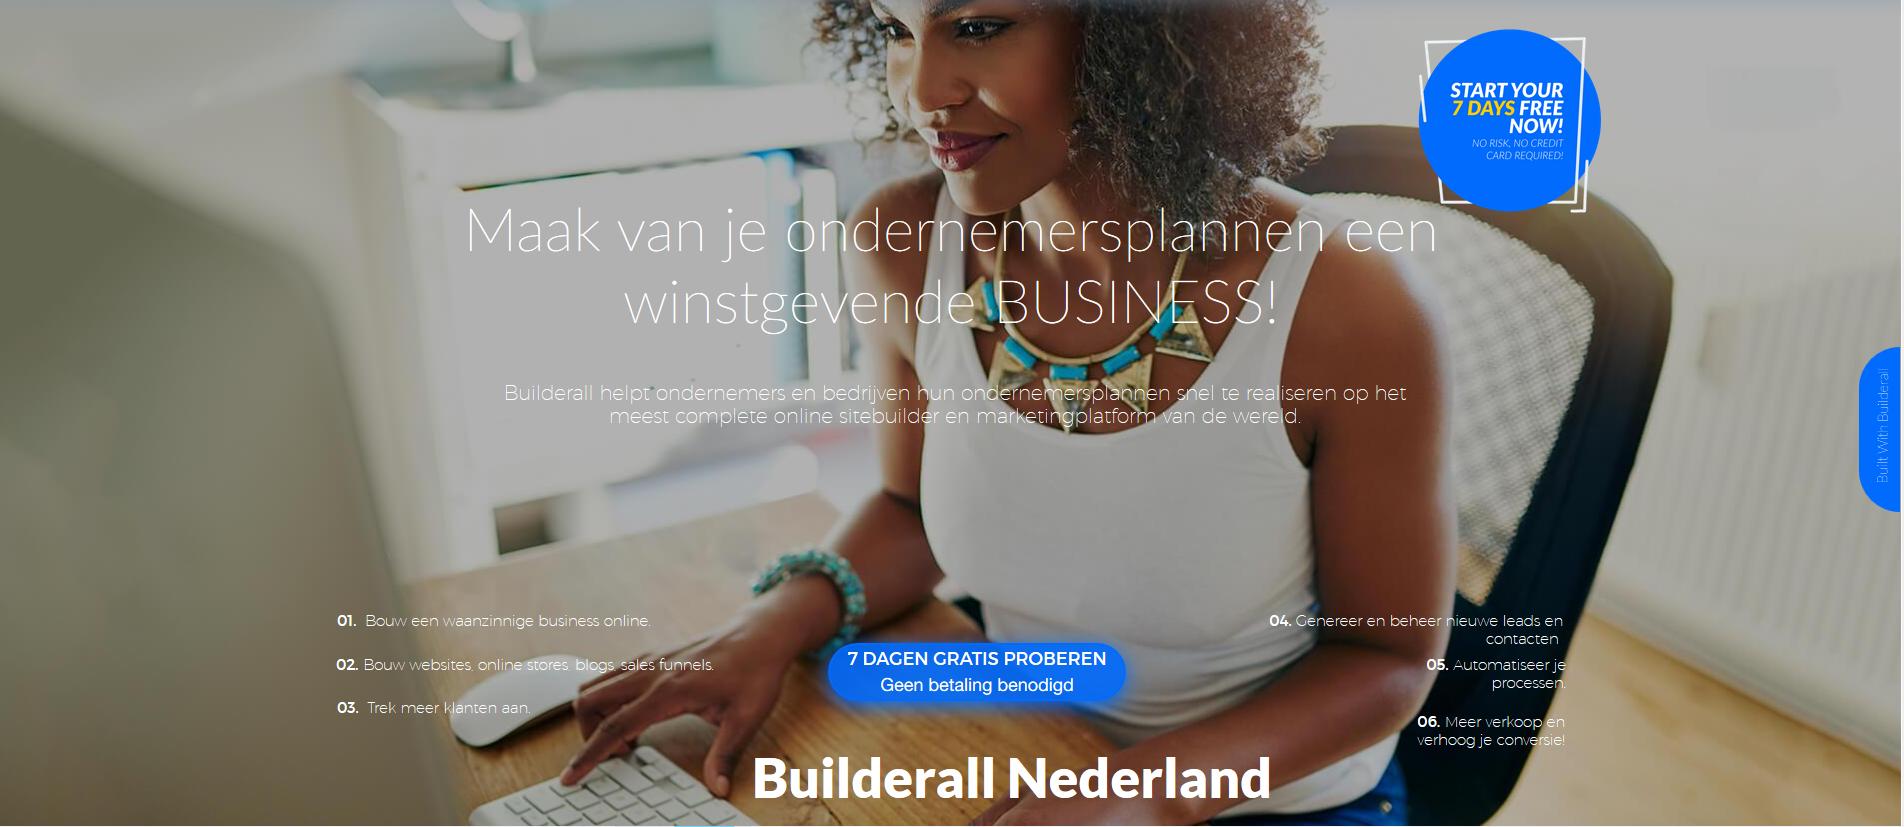 builderall nederland review